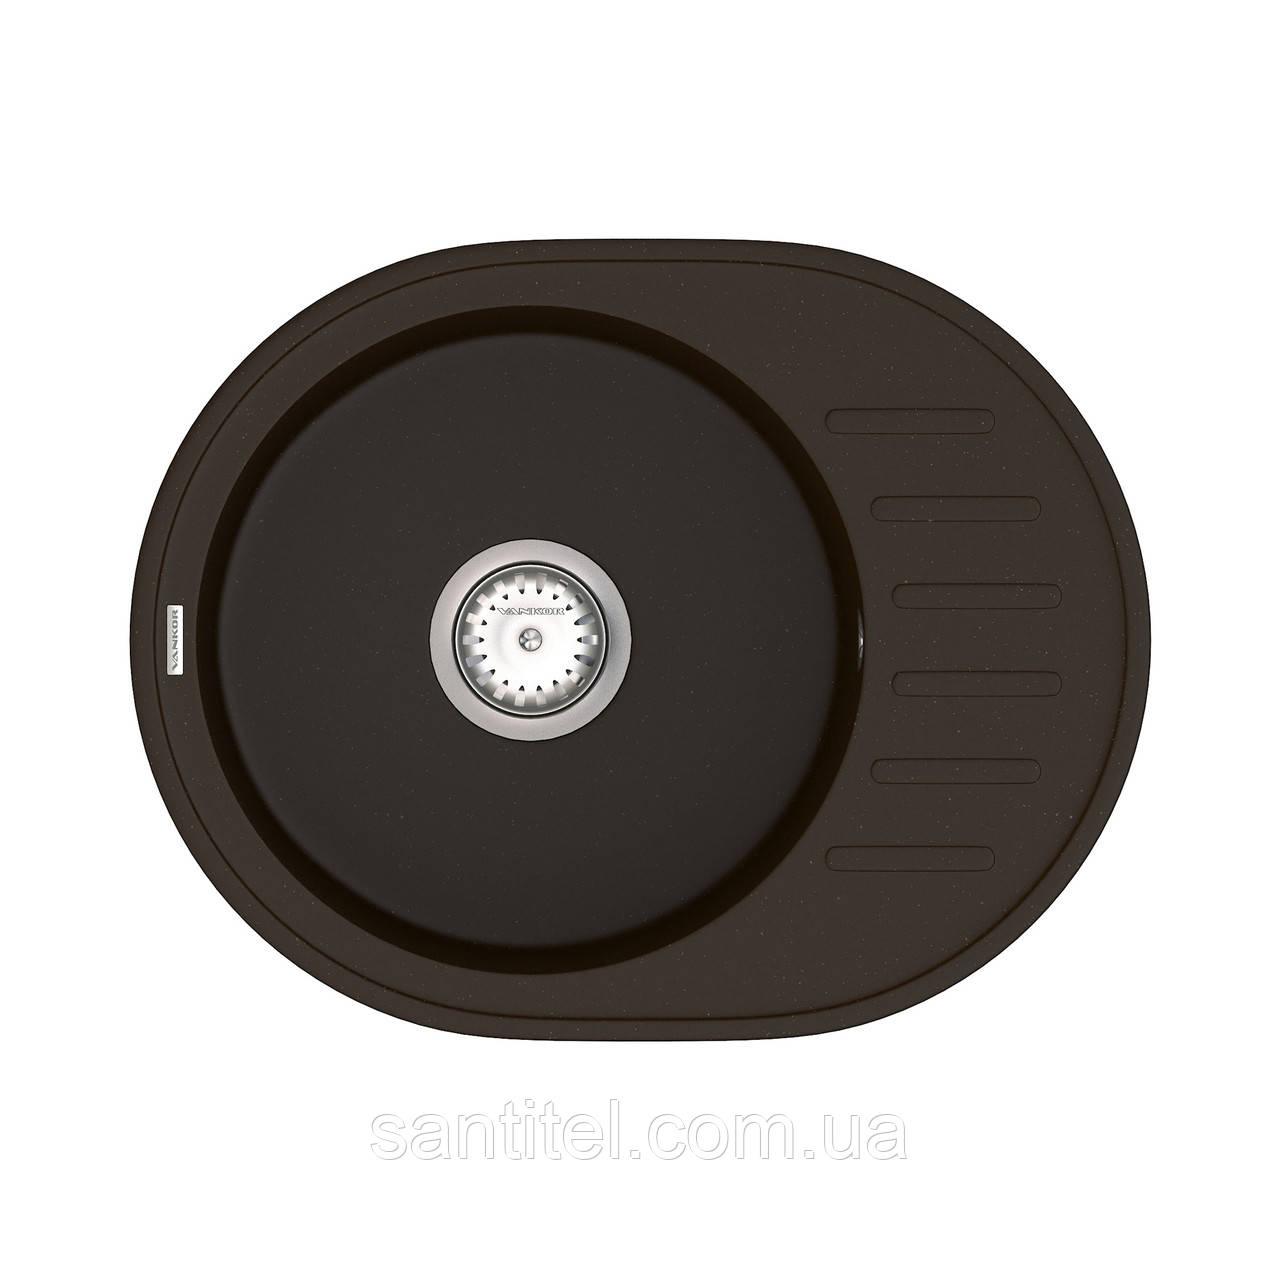 Кухонна мийка VANKOR Lira LMO 02.57 Chocolate + сифон VANKOR